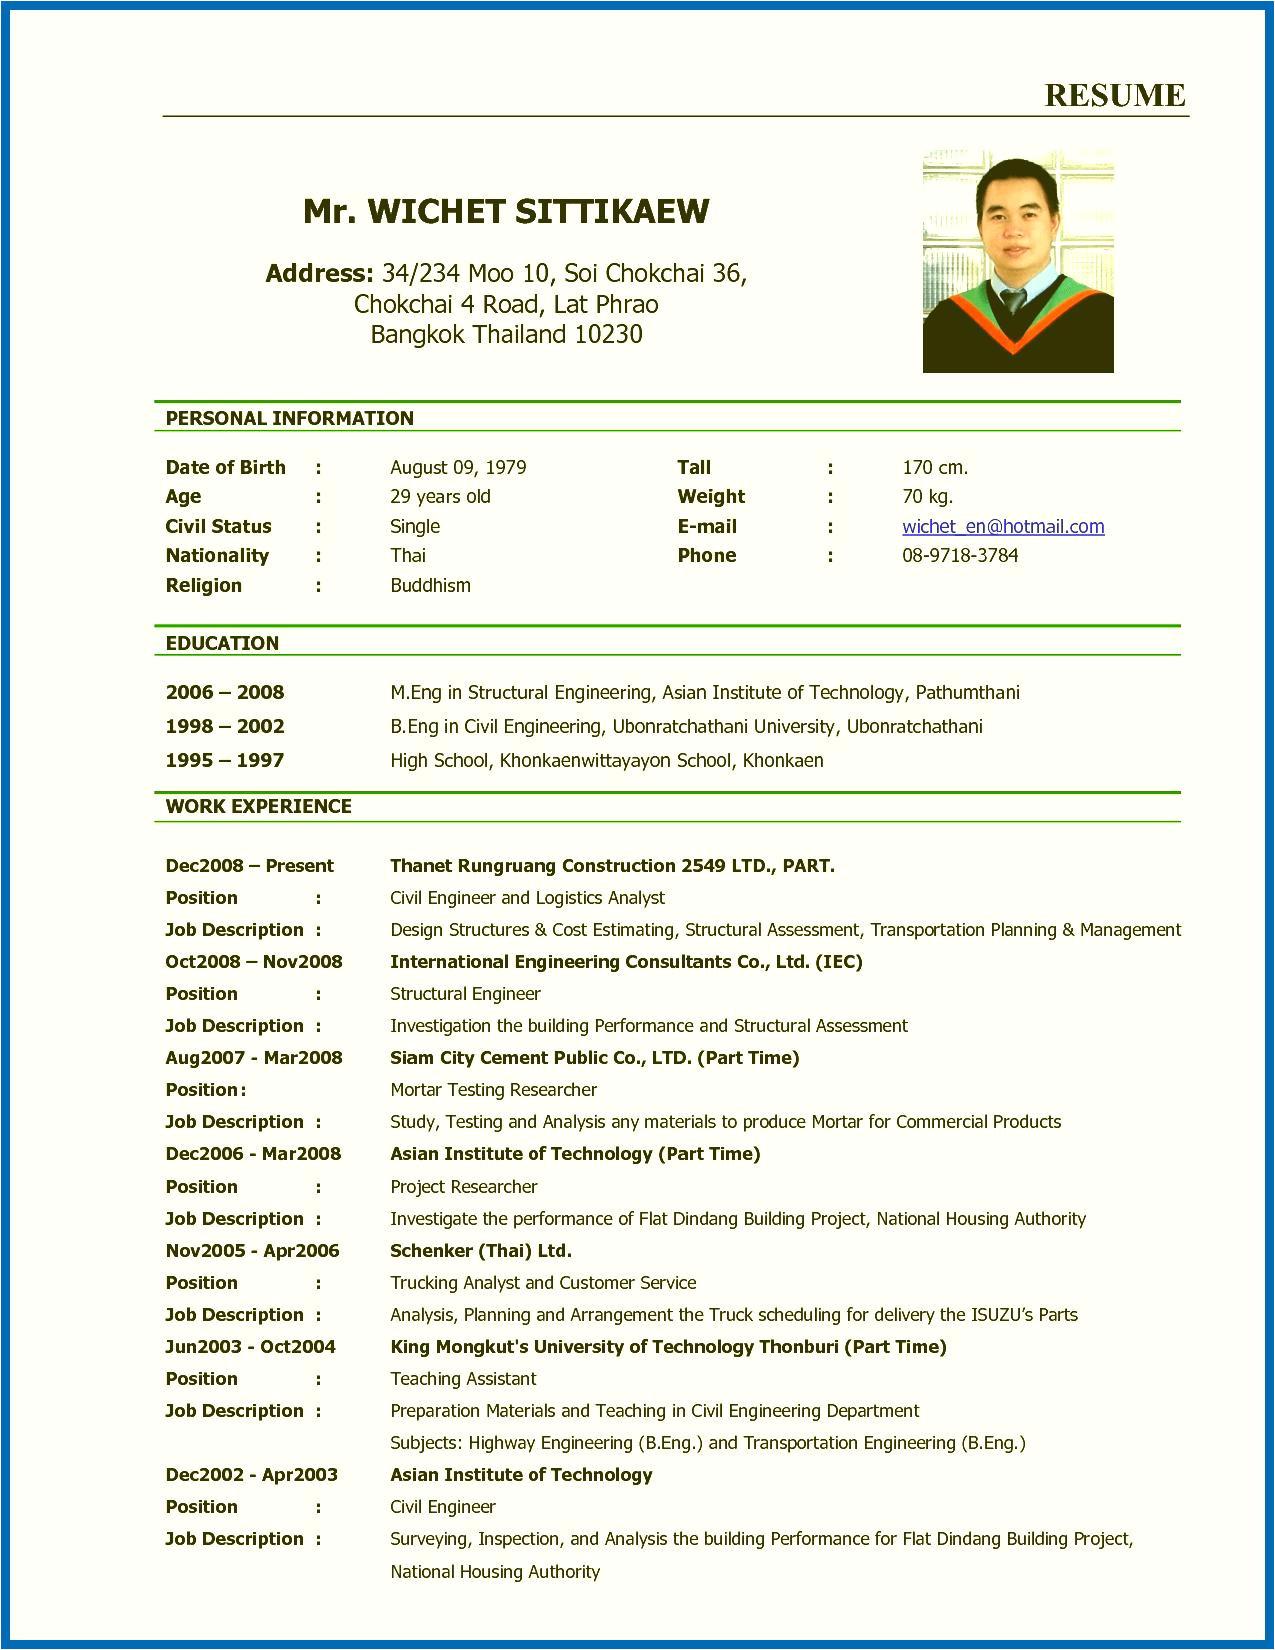 13 cv in applications for a teaching job